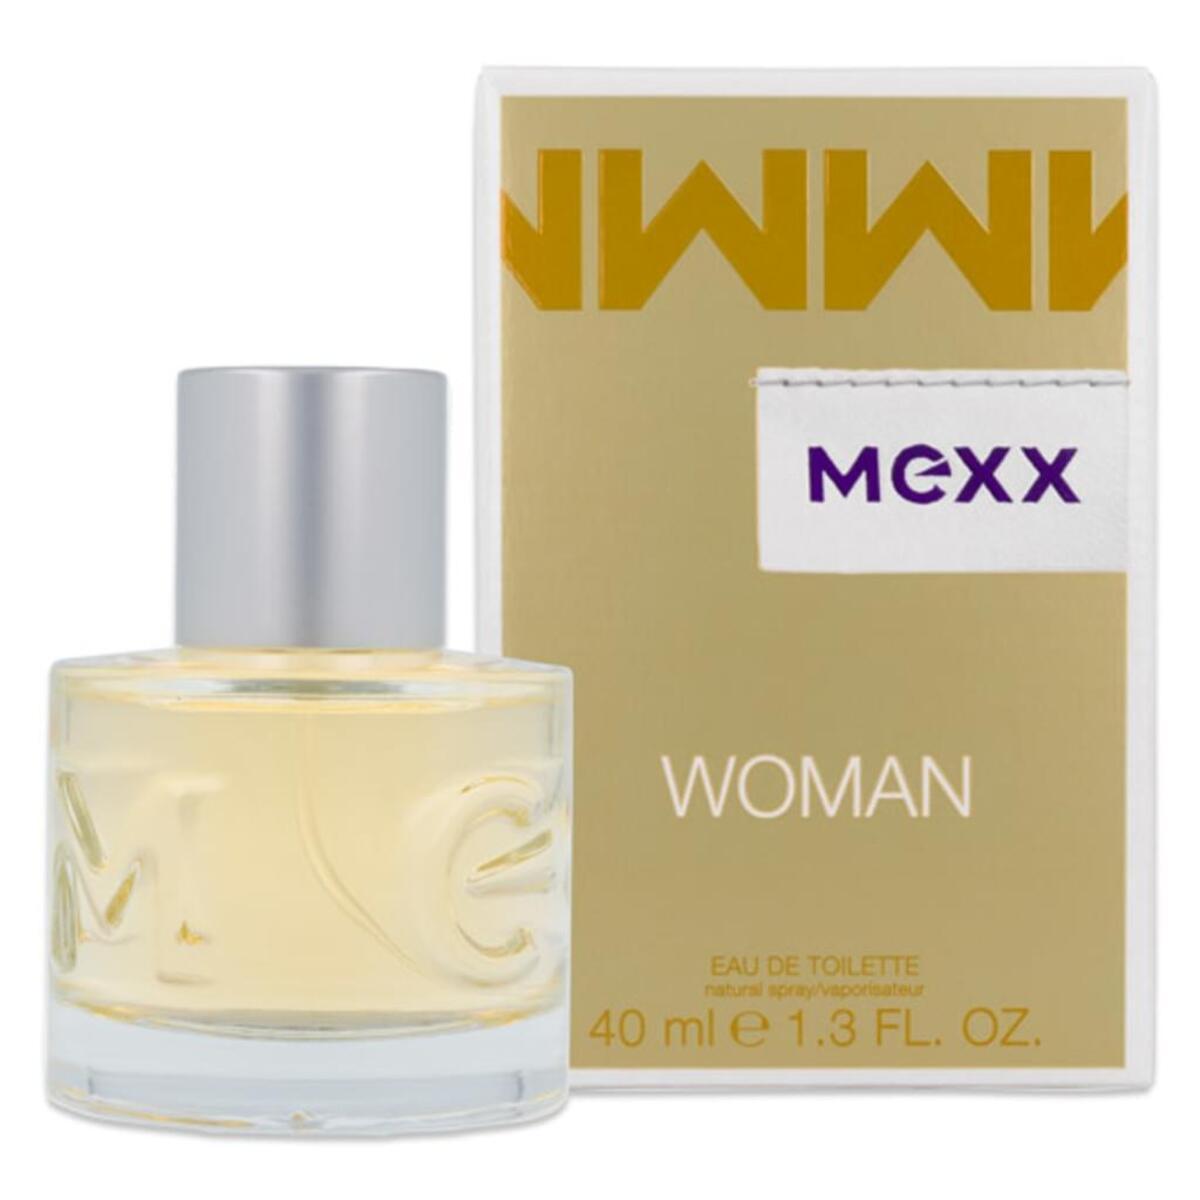 Bild 1 von Mexx Woman Eau de Toilette 40ml Spray